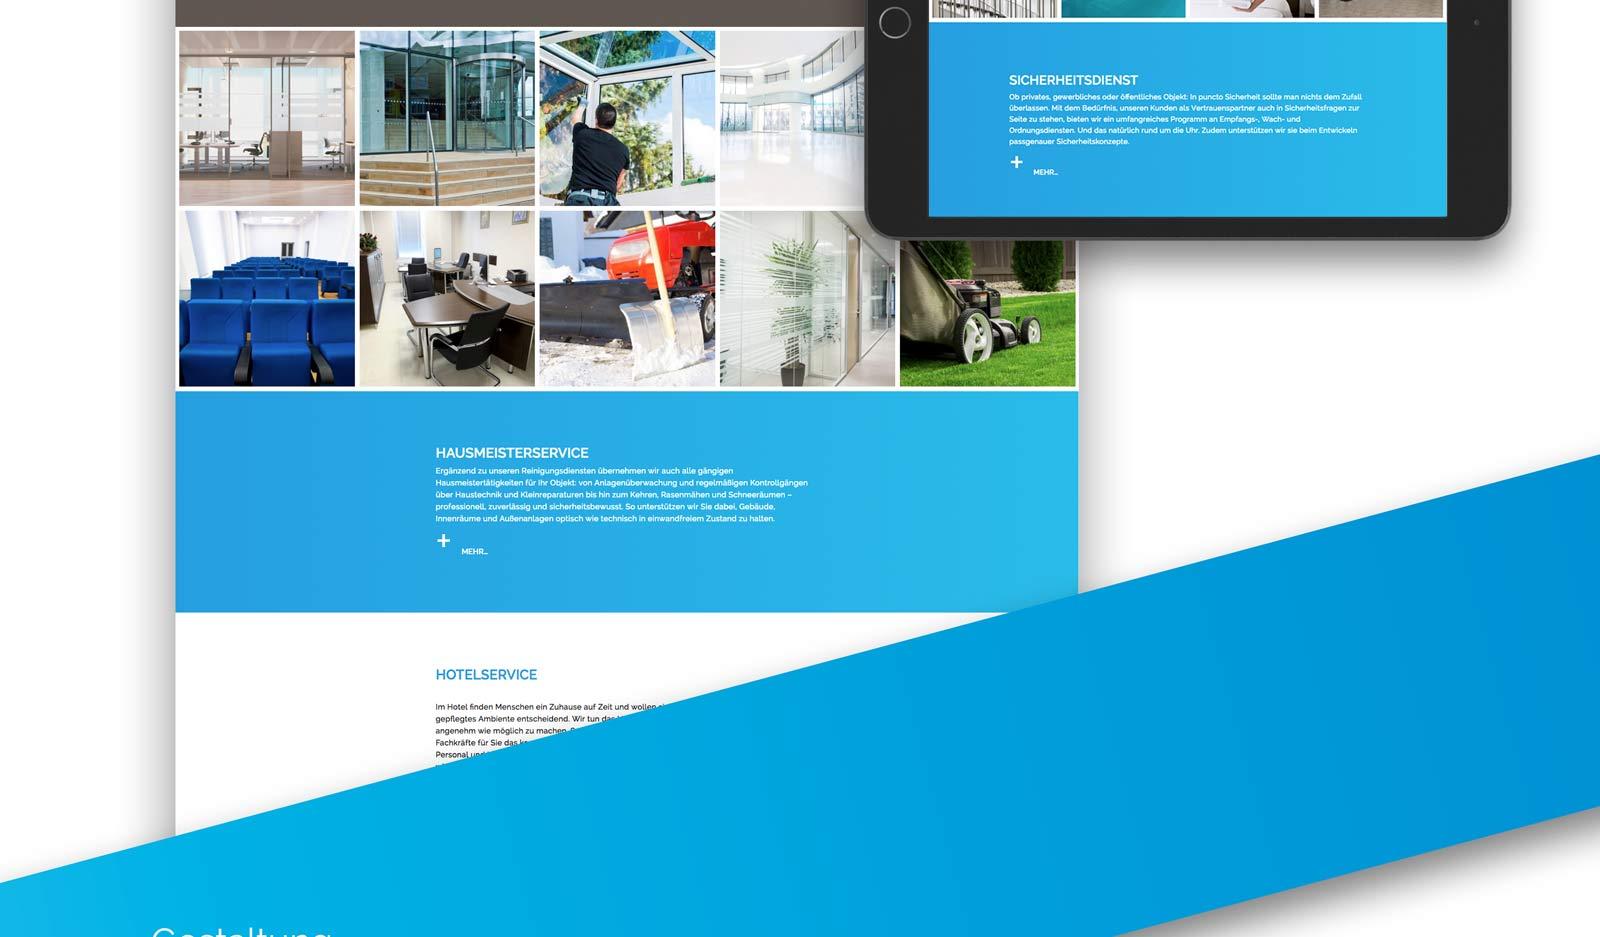 Liebl_Responsive_Webdesign_9.jpg